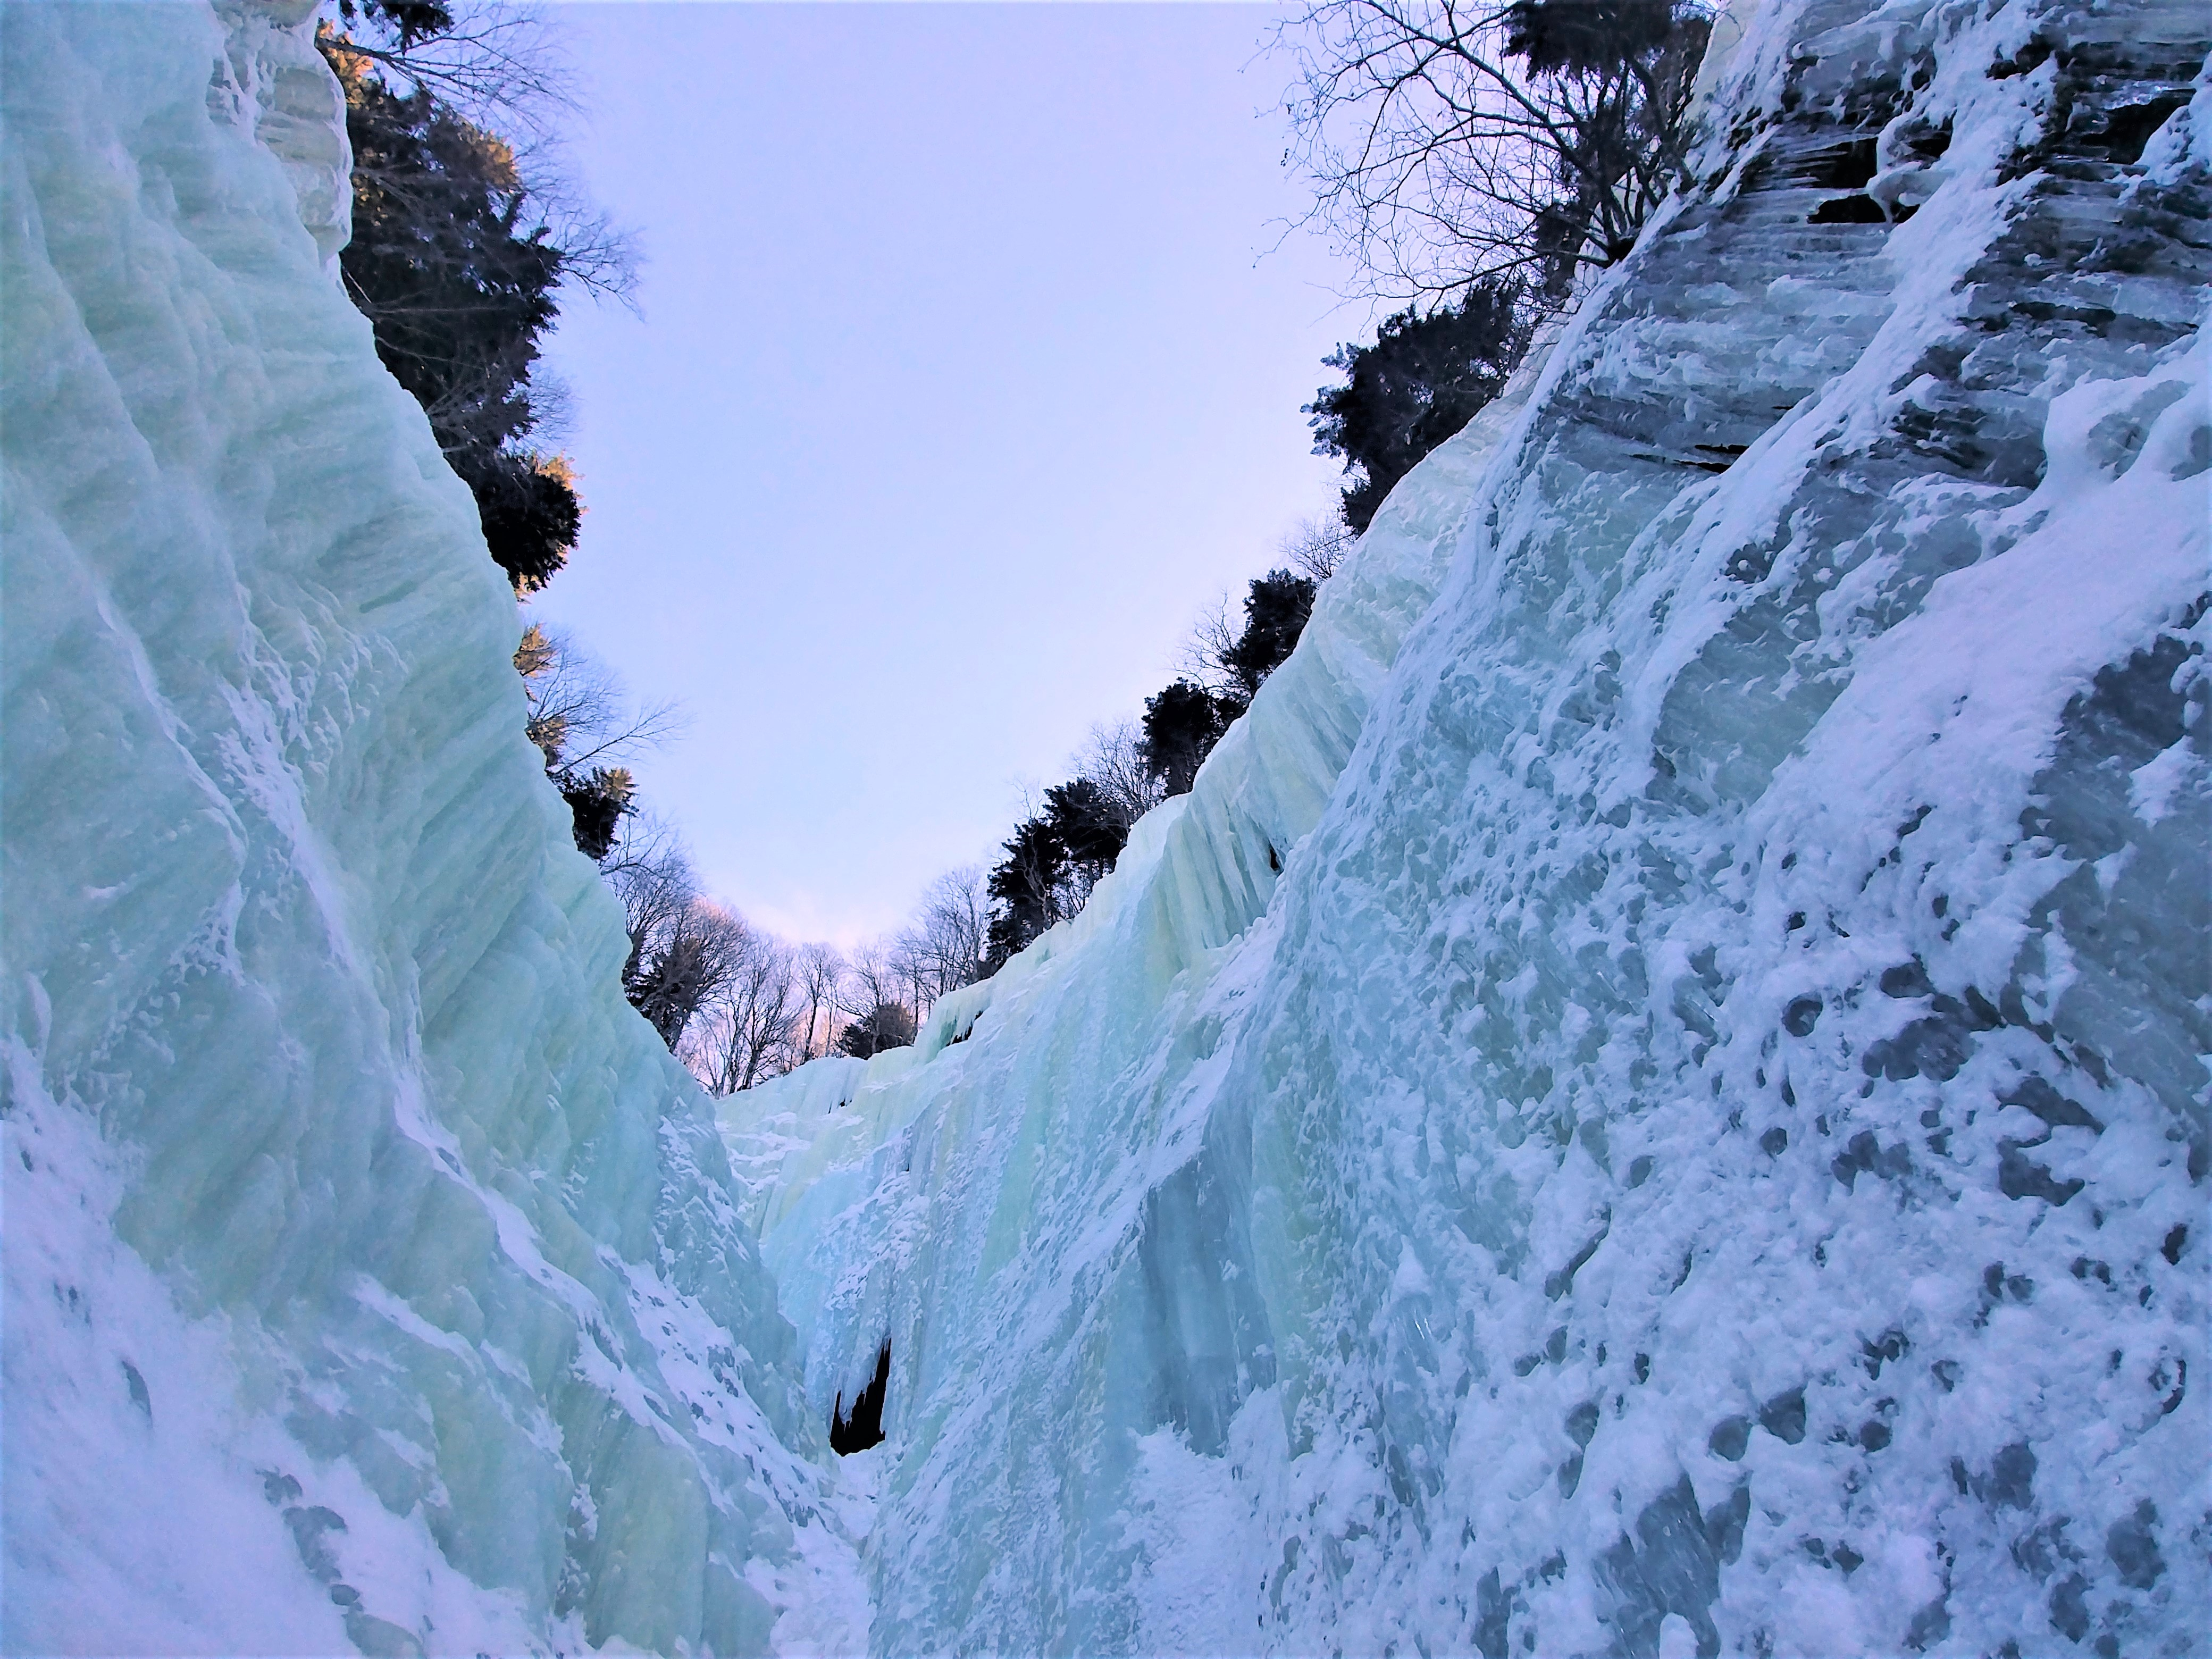 cascade de glace hiver randonnee raquettes nouveau-brunswick canada